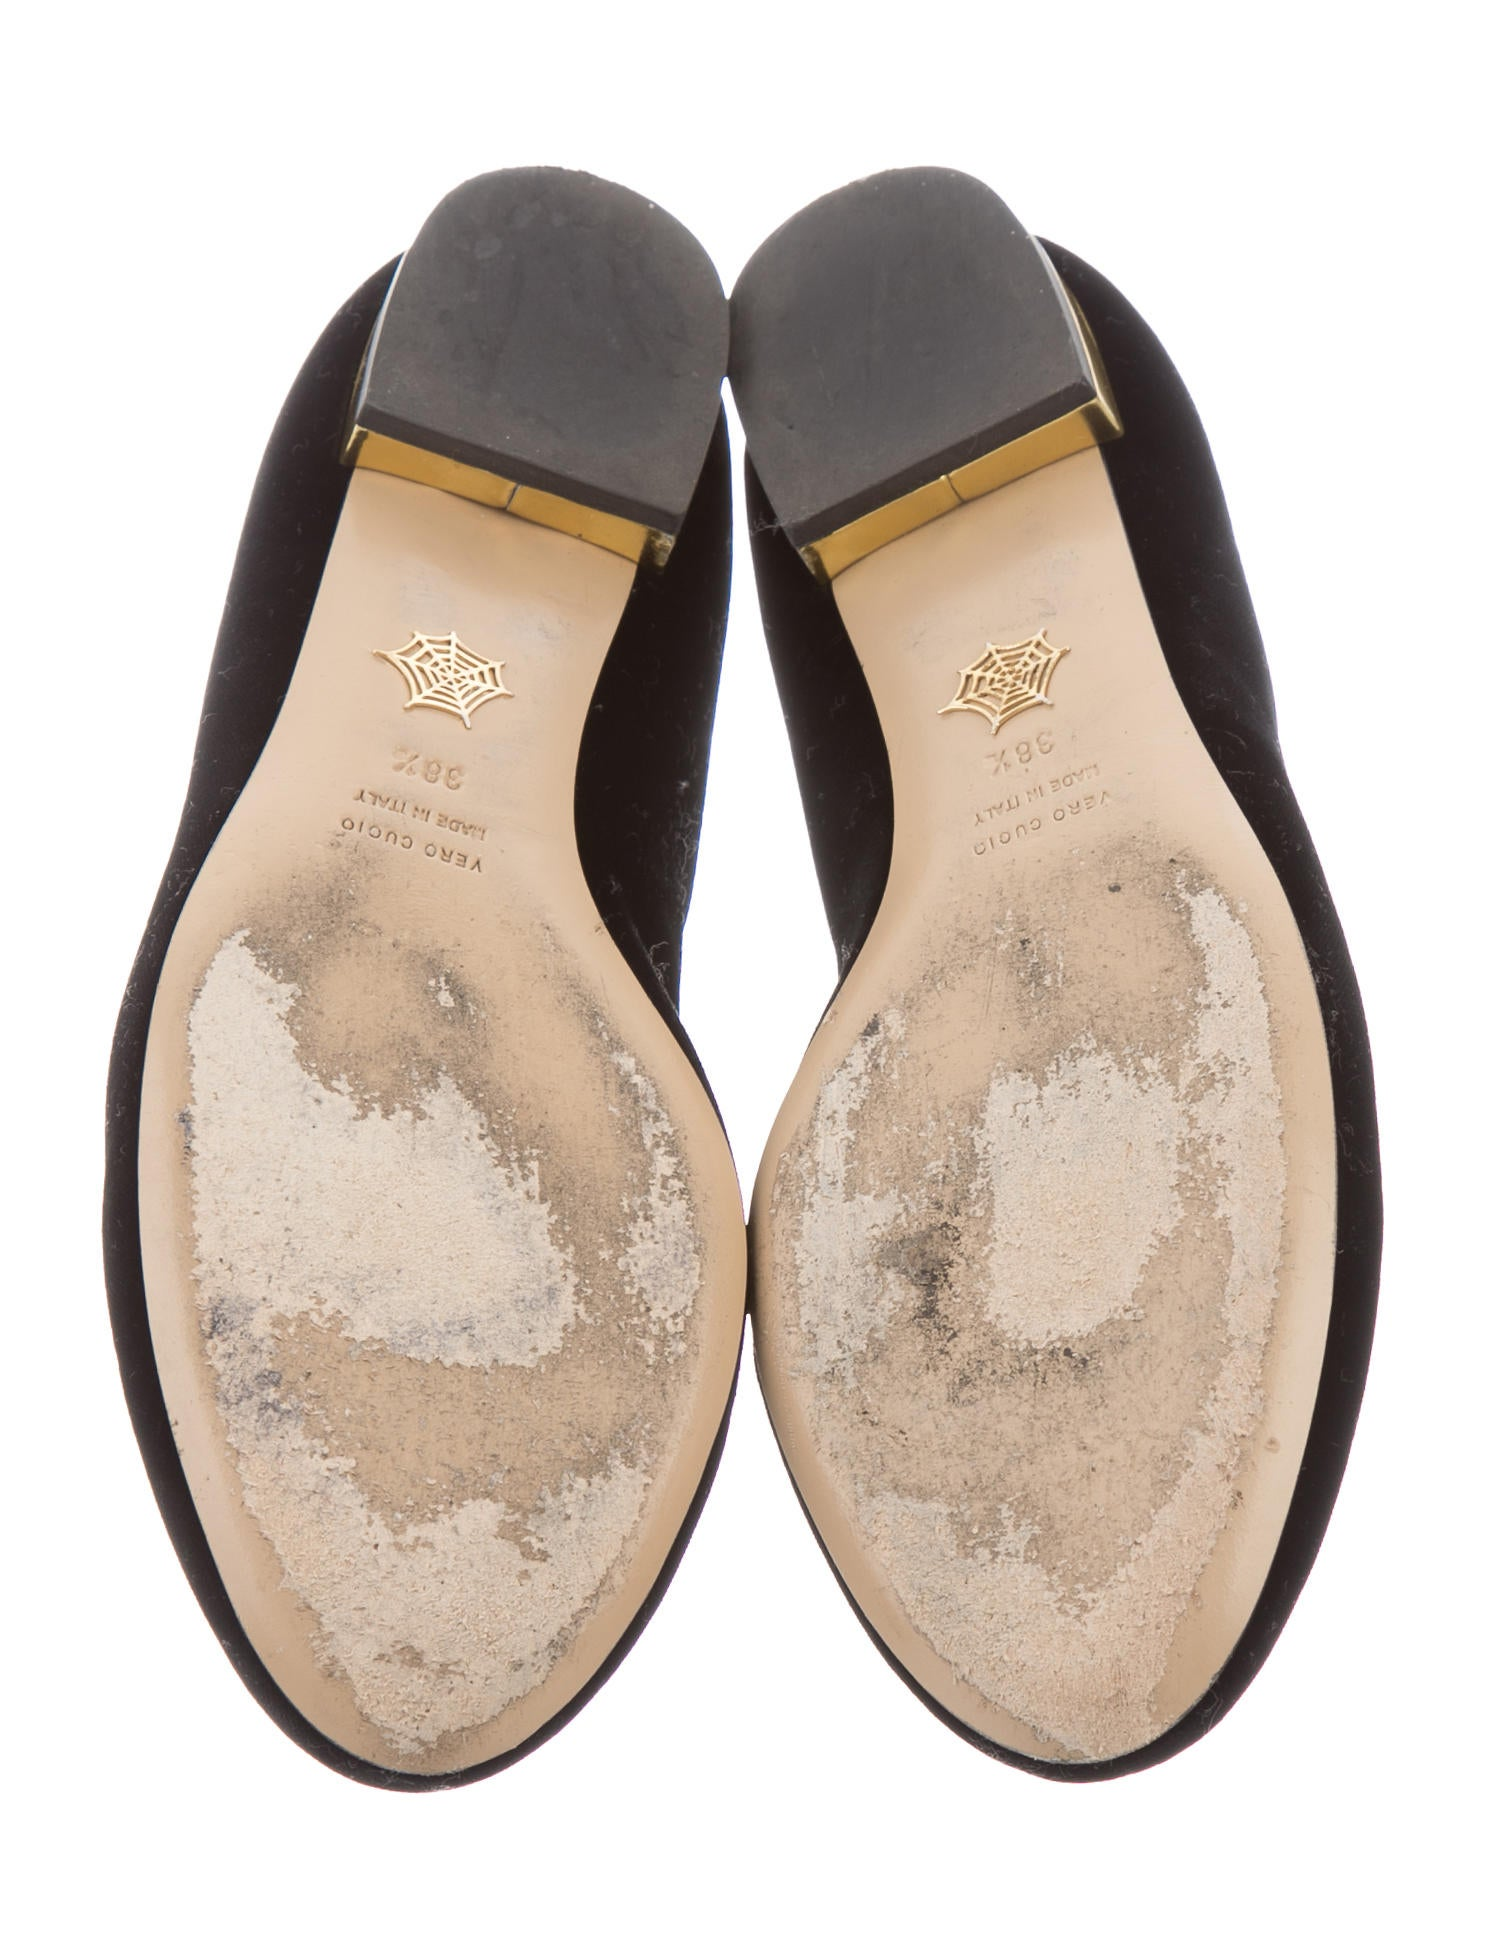 Charlotte Olympia Velvet Kitty Flats Shoes Cio23620